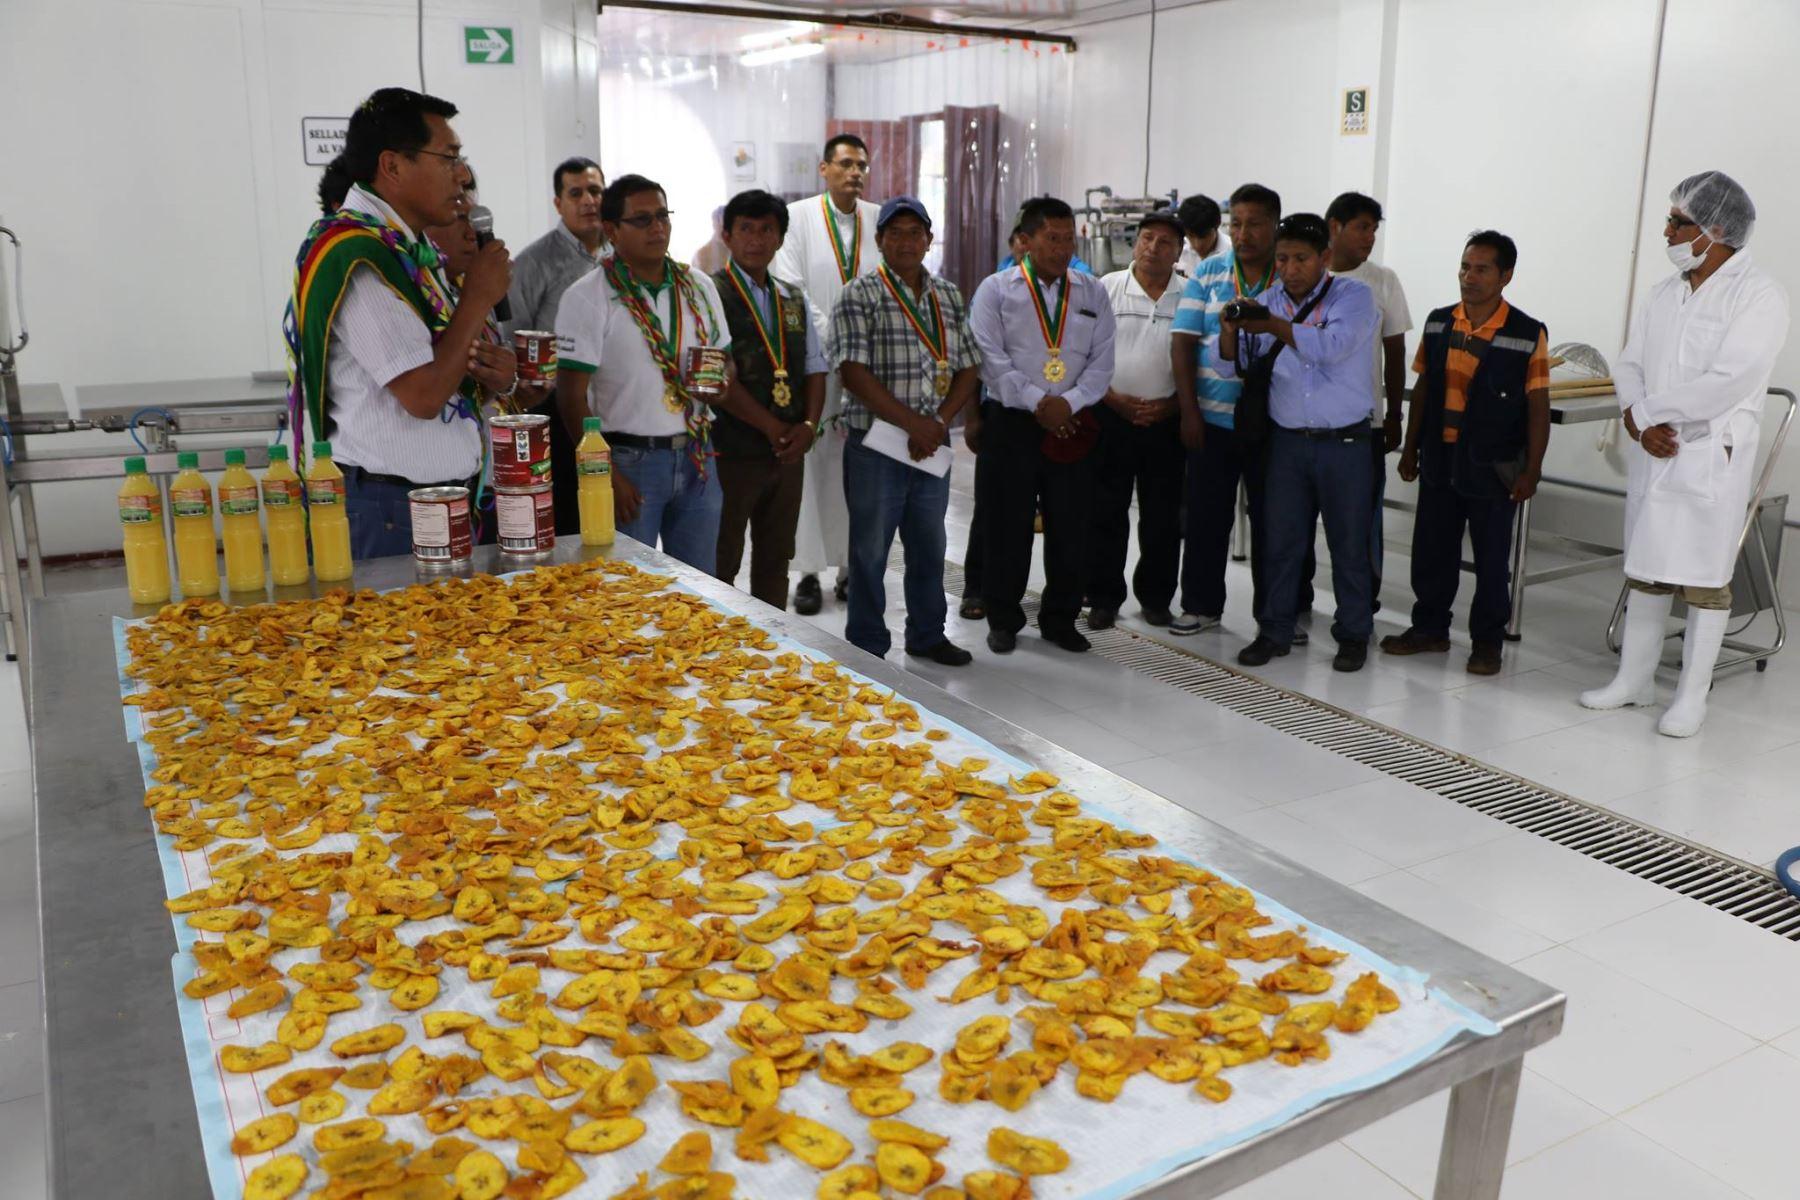 Con nueva planta procesadora, agricultores de San Gabán, en Puno, fabricarán néctares de fruta. ANDINA